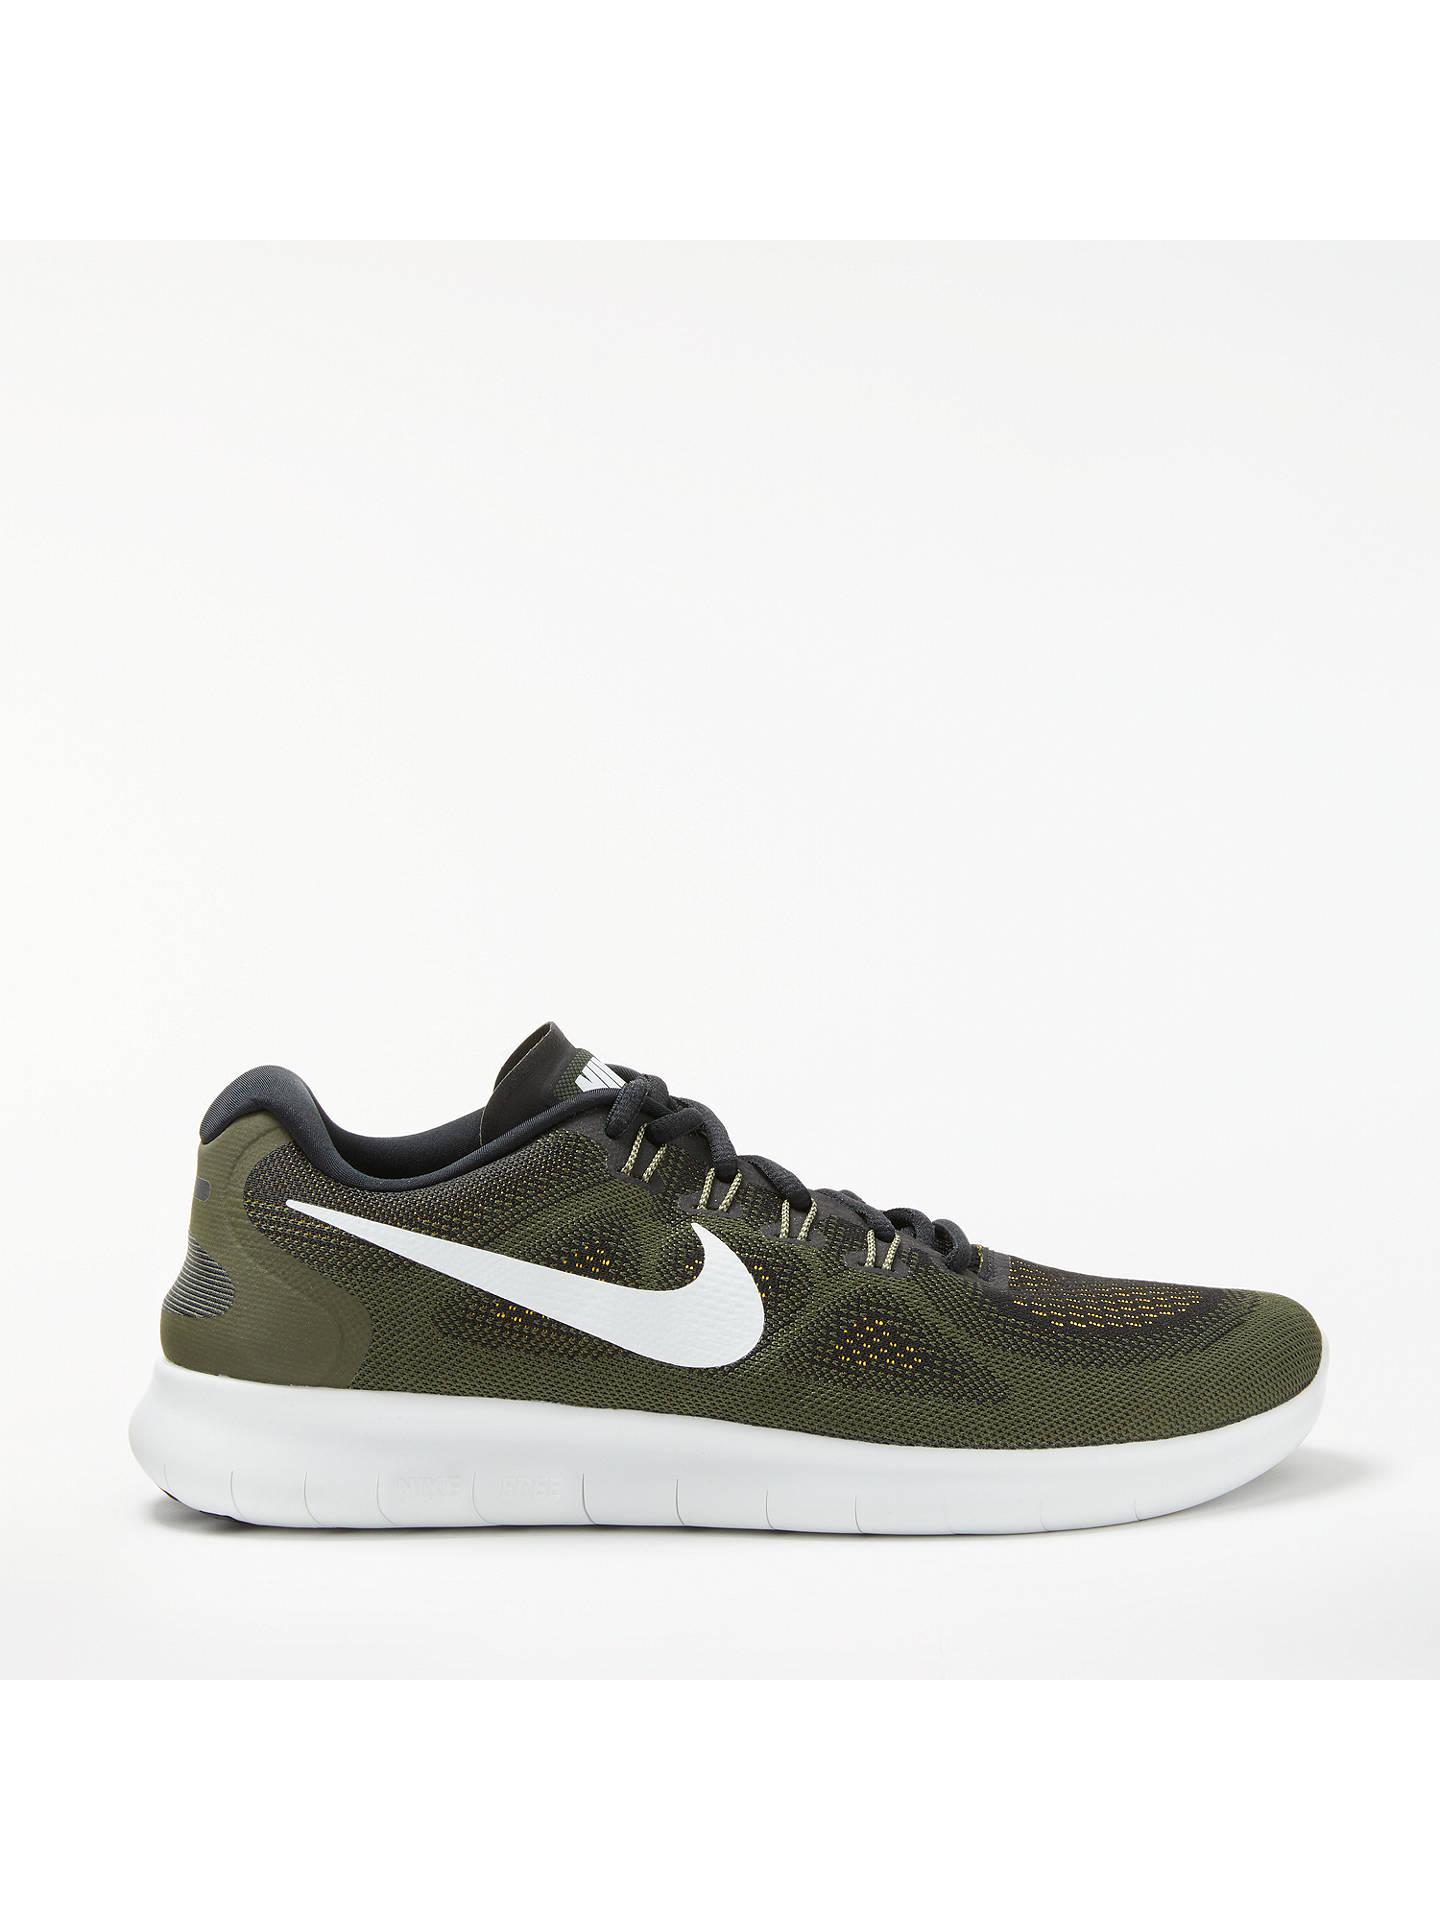 4fed3049f7b13 Buy Nike Free RN 2017 Men s Running Shoe